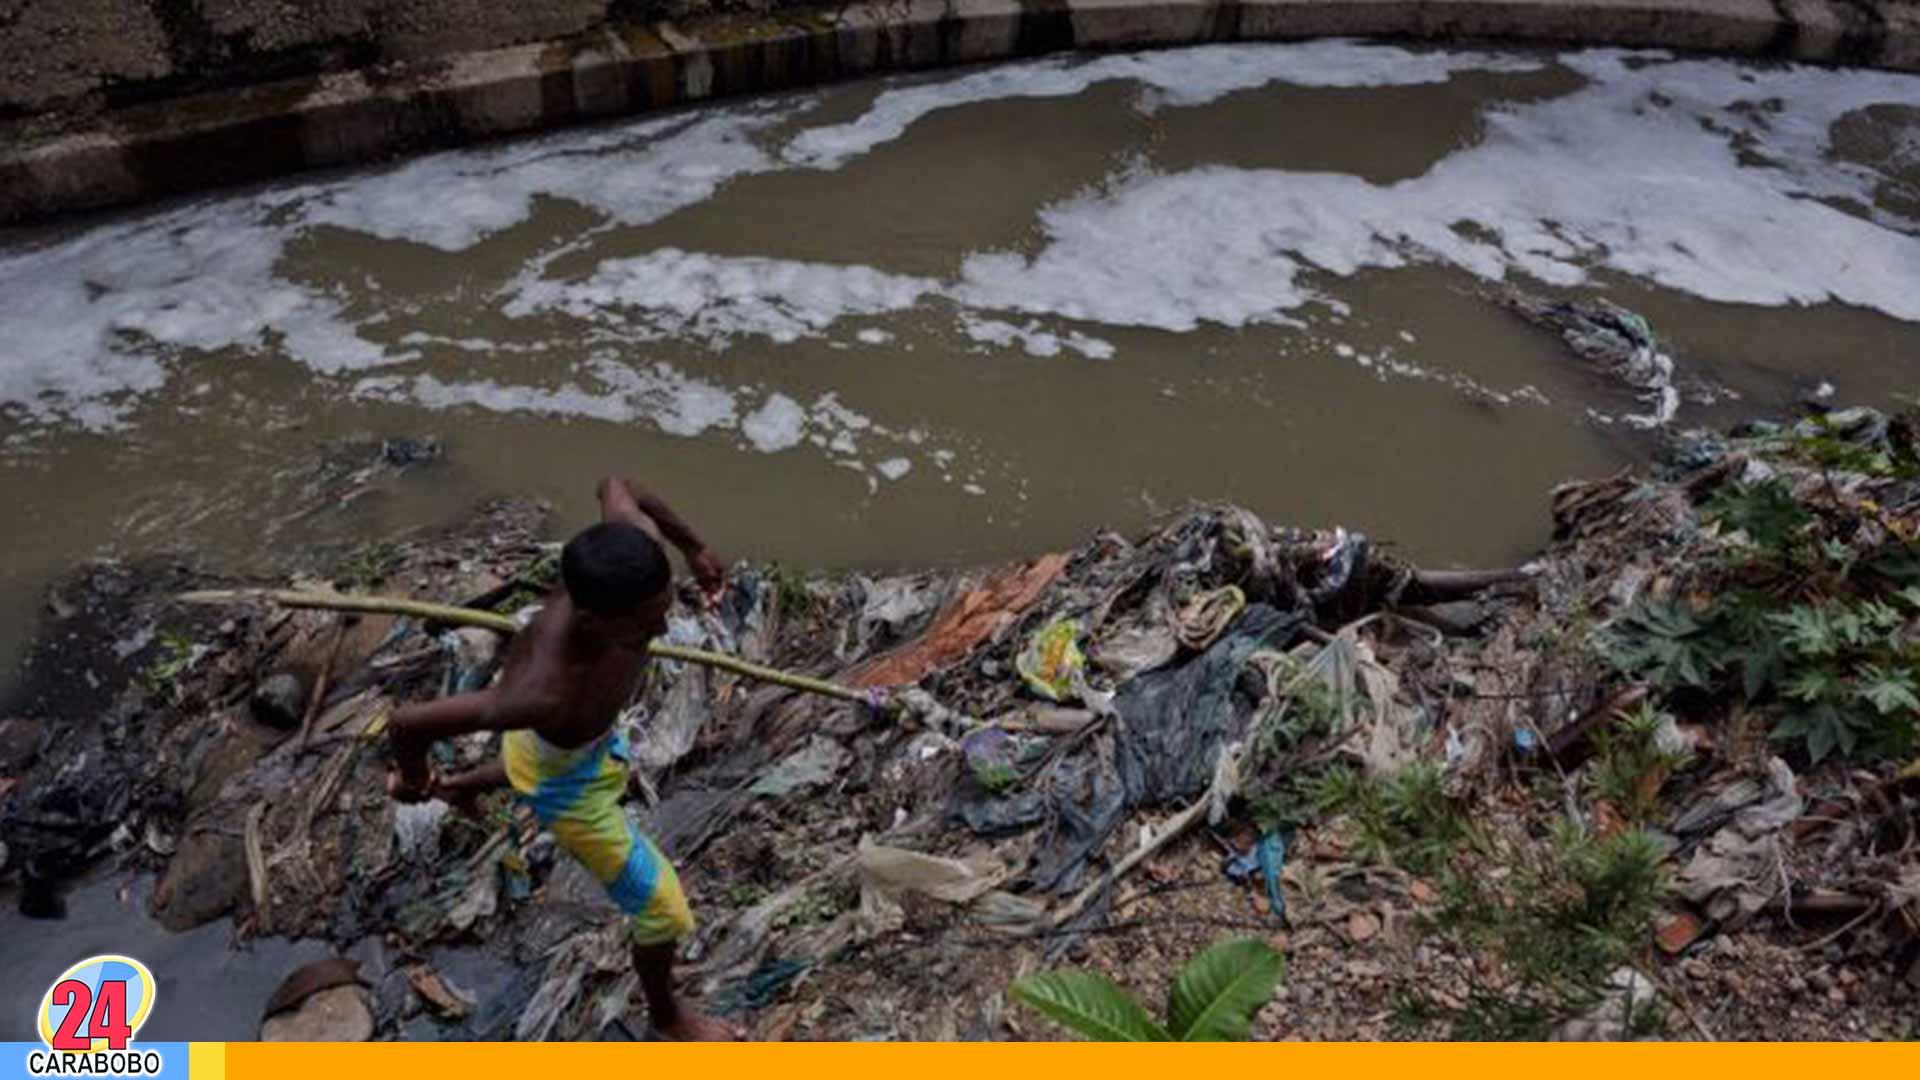 Mineros en el Río Guaire - Mineros en el Río Guaire